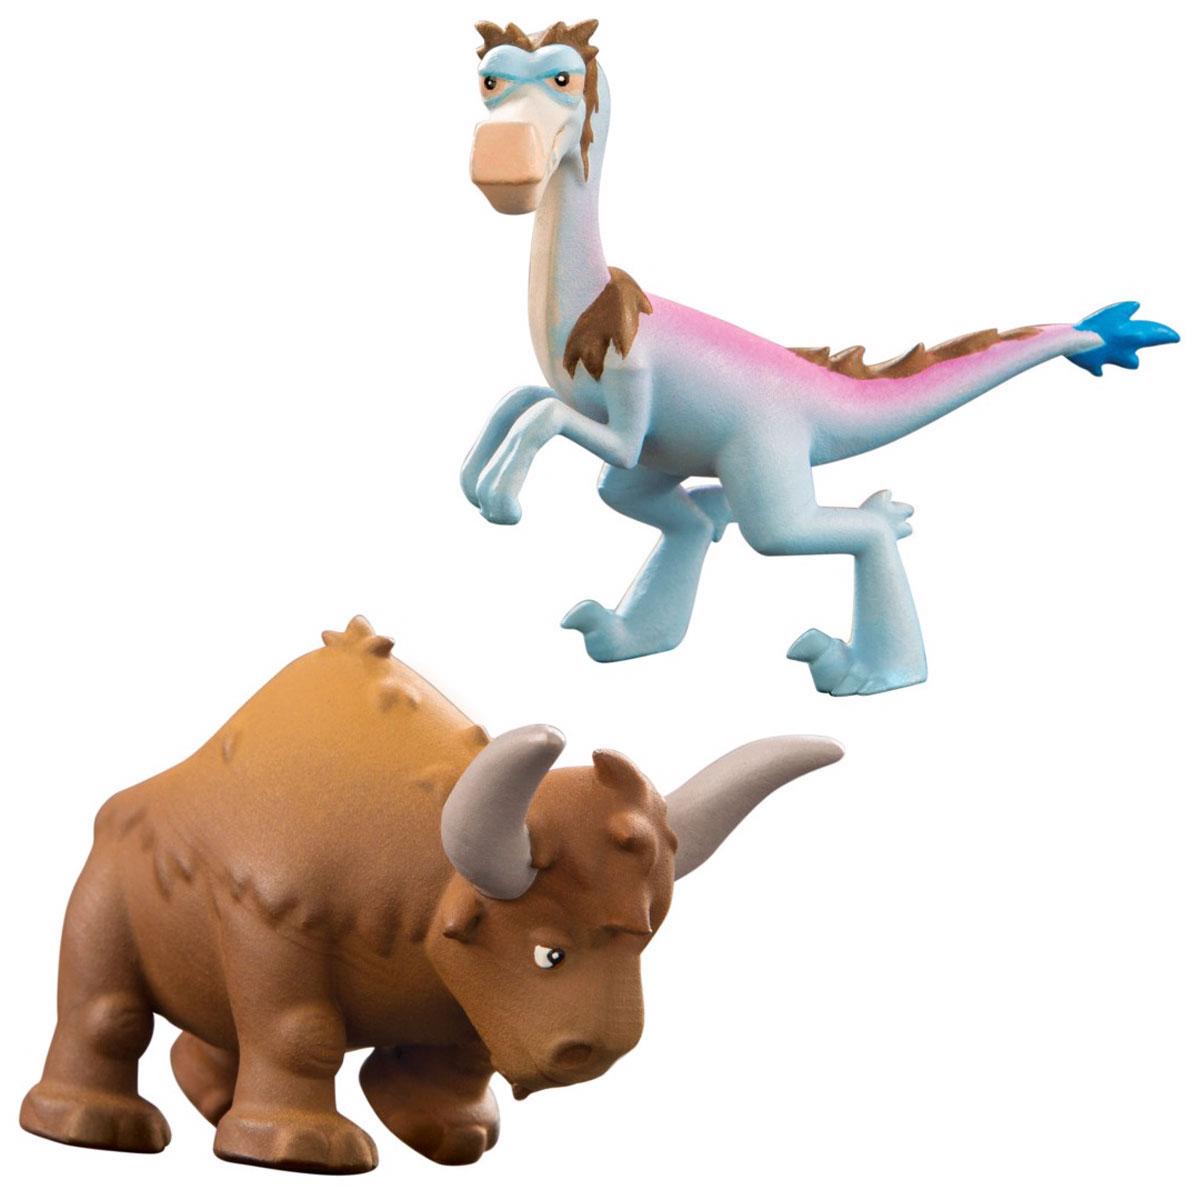 Хороший динозавр Набор фигурок Кеттл и Бабба набор фигурок good dinosaur кеттл и раптор 62305